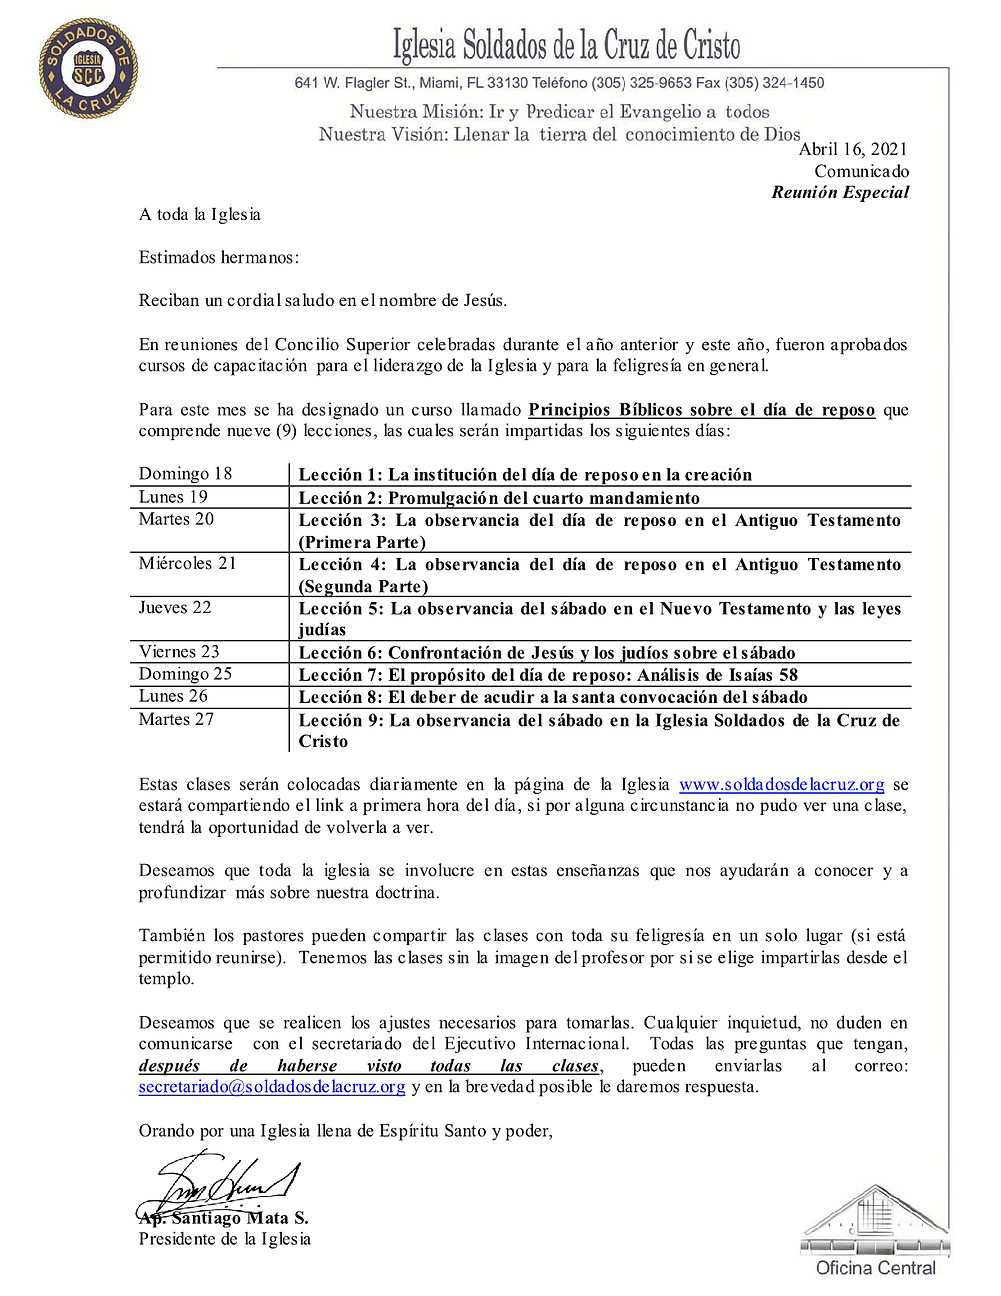 Comunicado Especial - Invitación Curso P